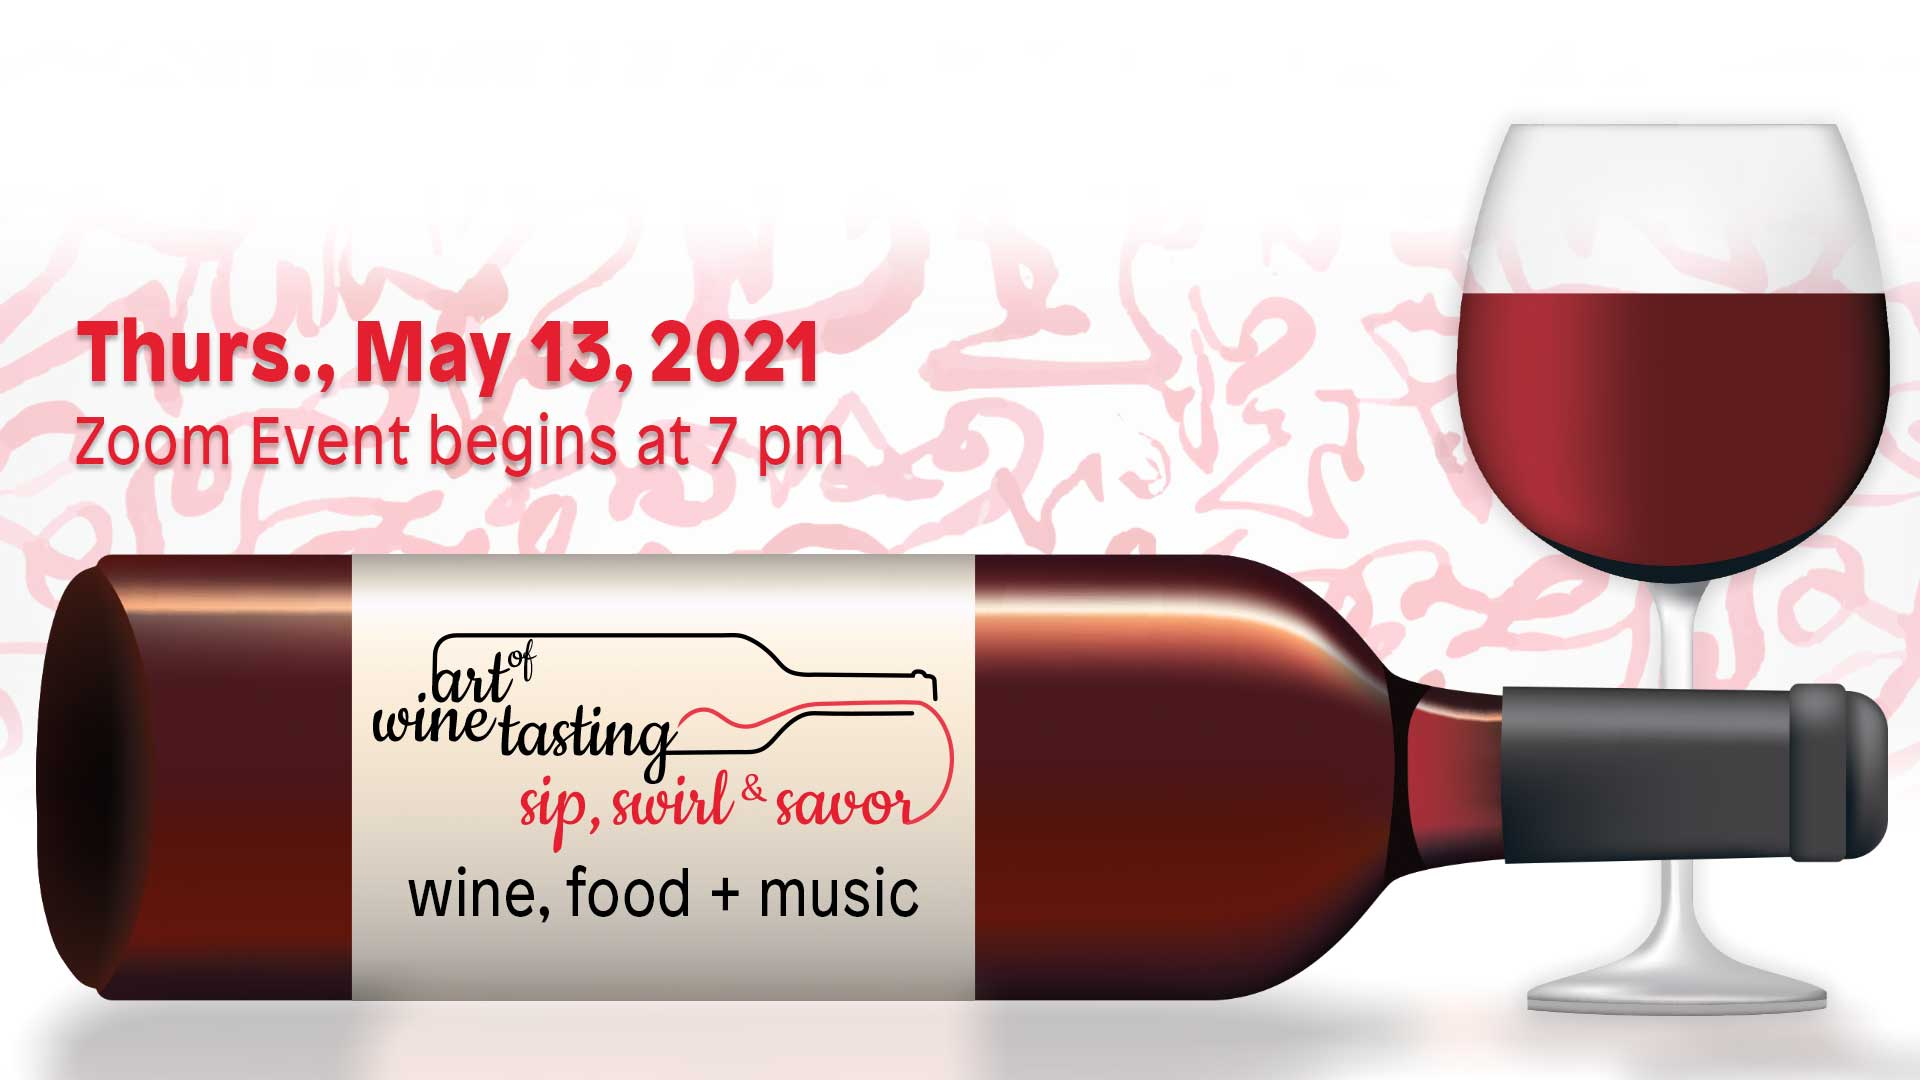 Art-of-wine-tasting-image-NOLOGO